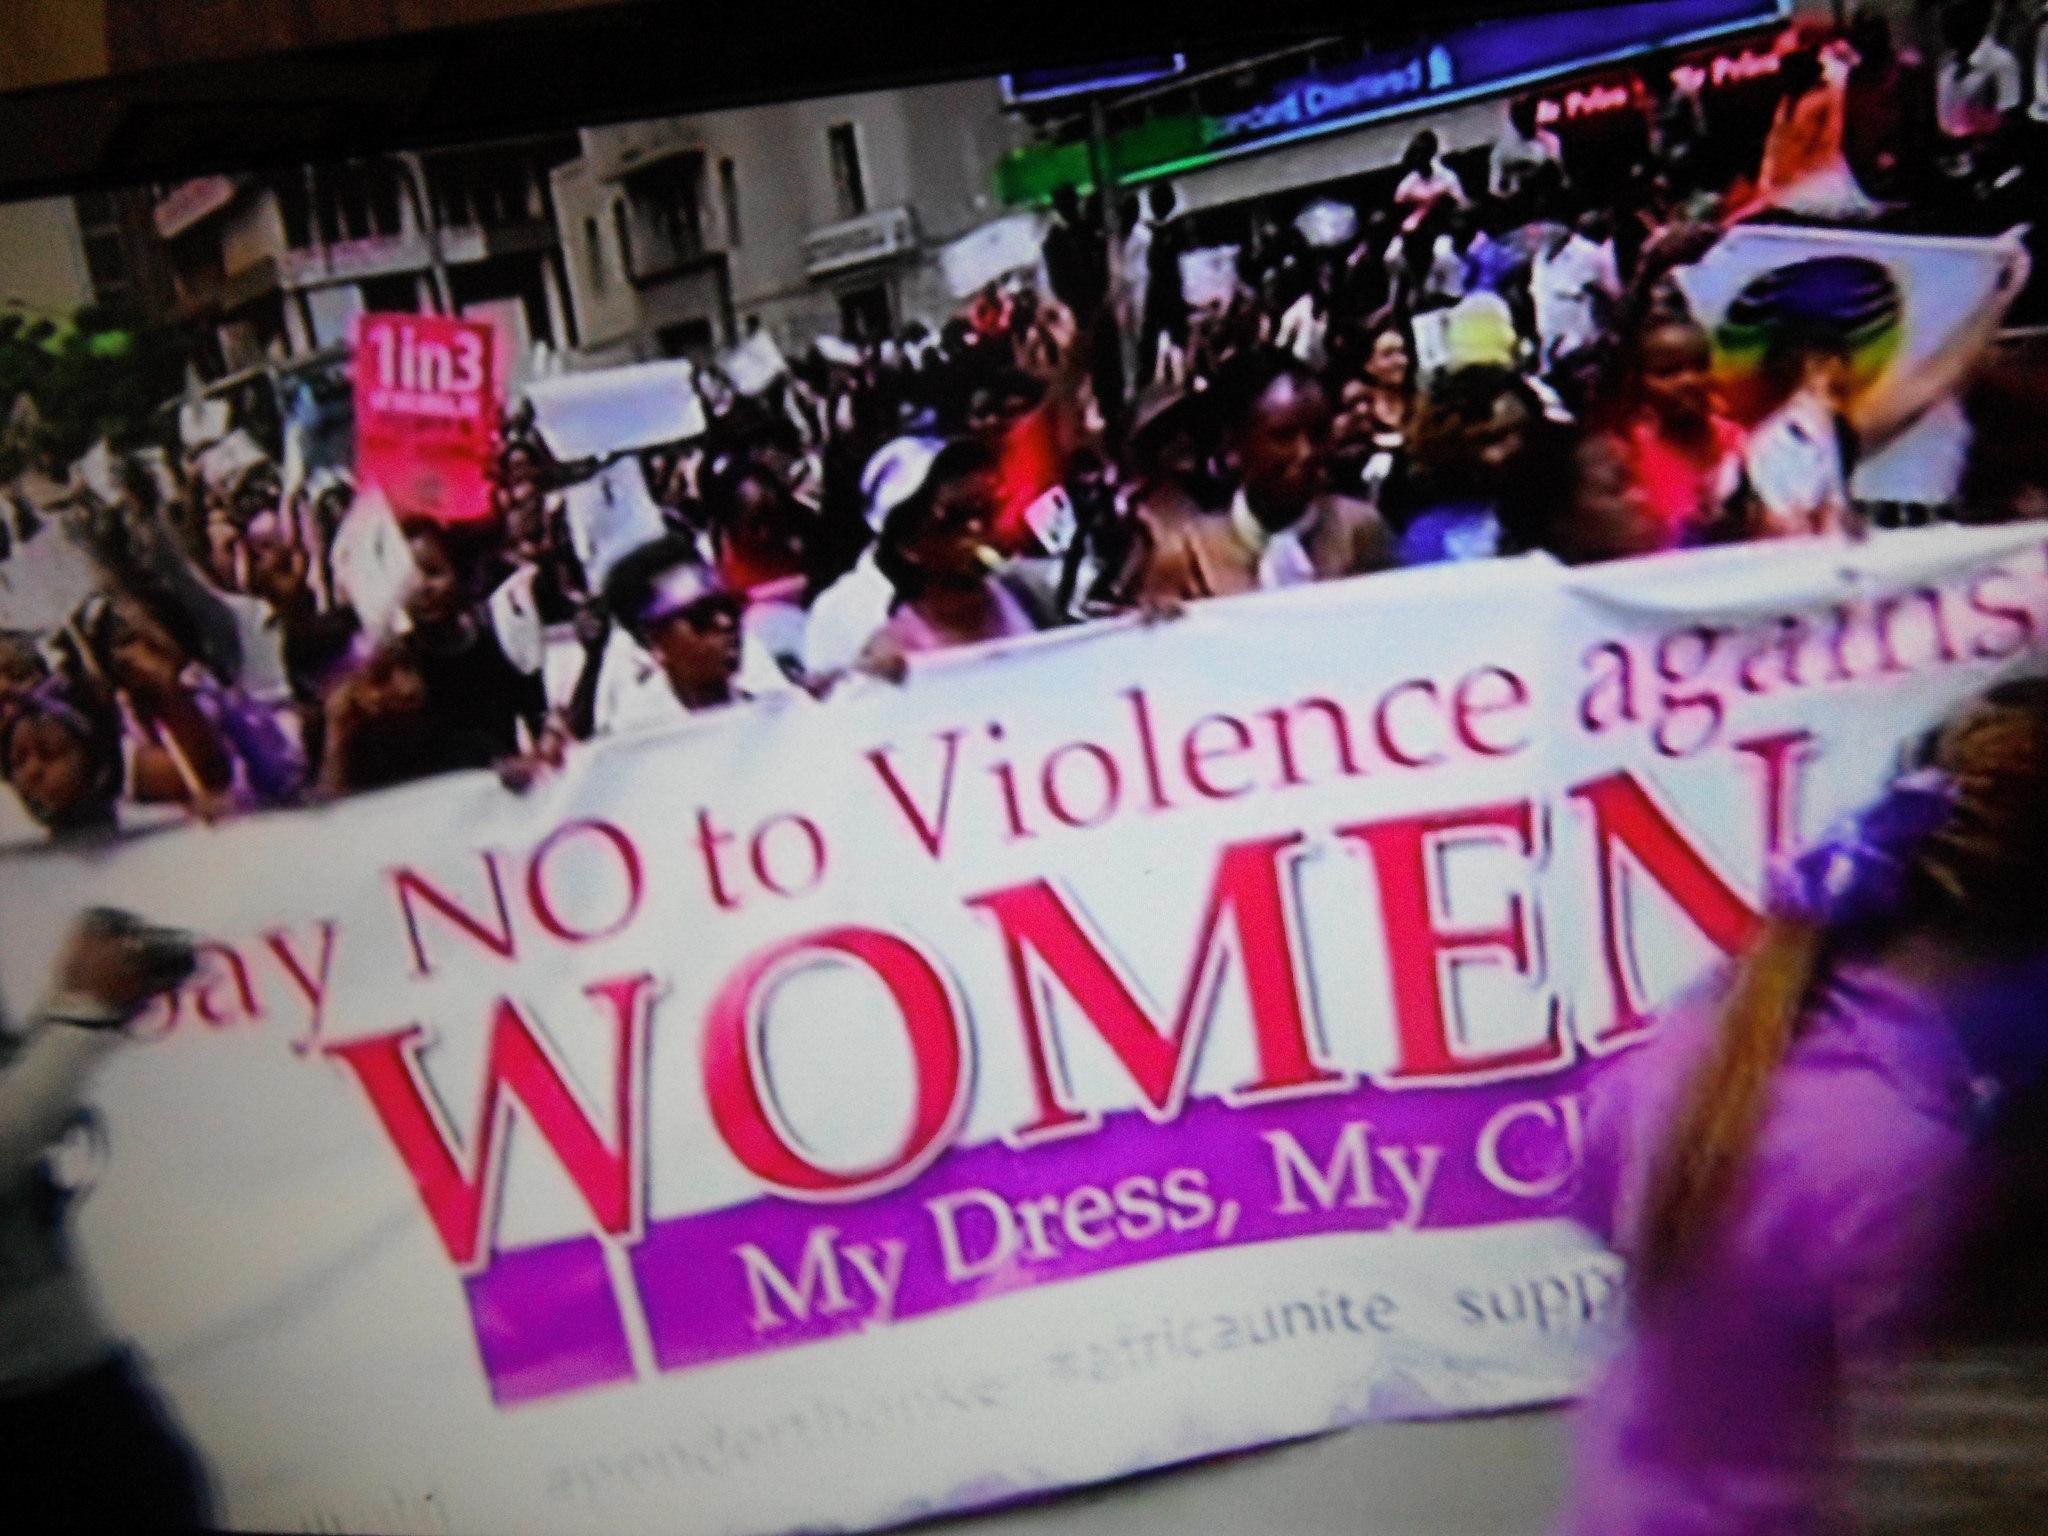 Violenza sulle donne: le frasi più belle per combatterla